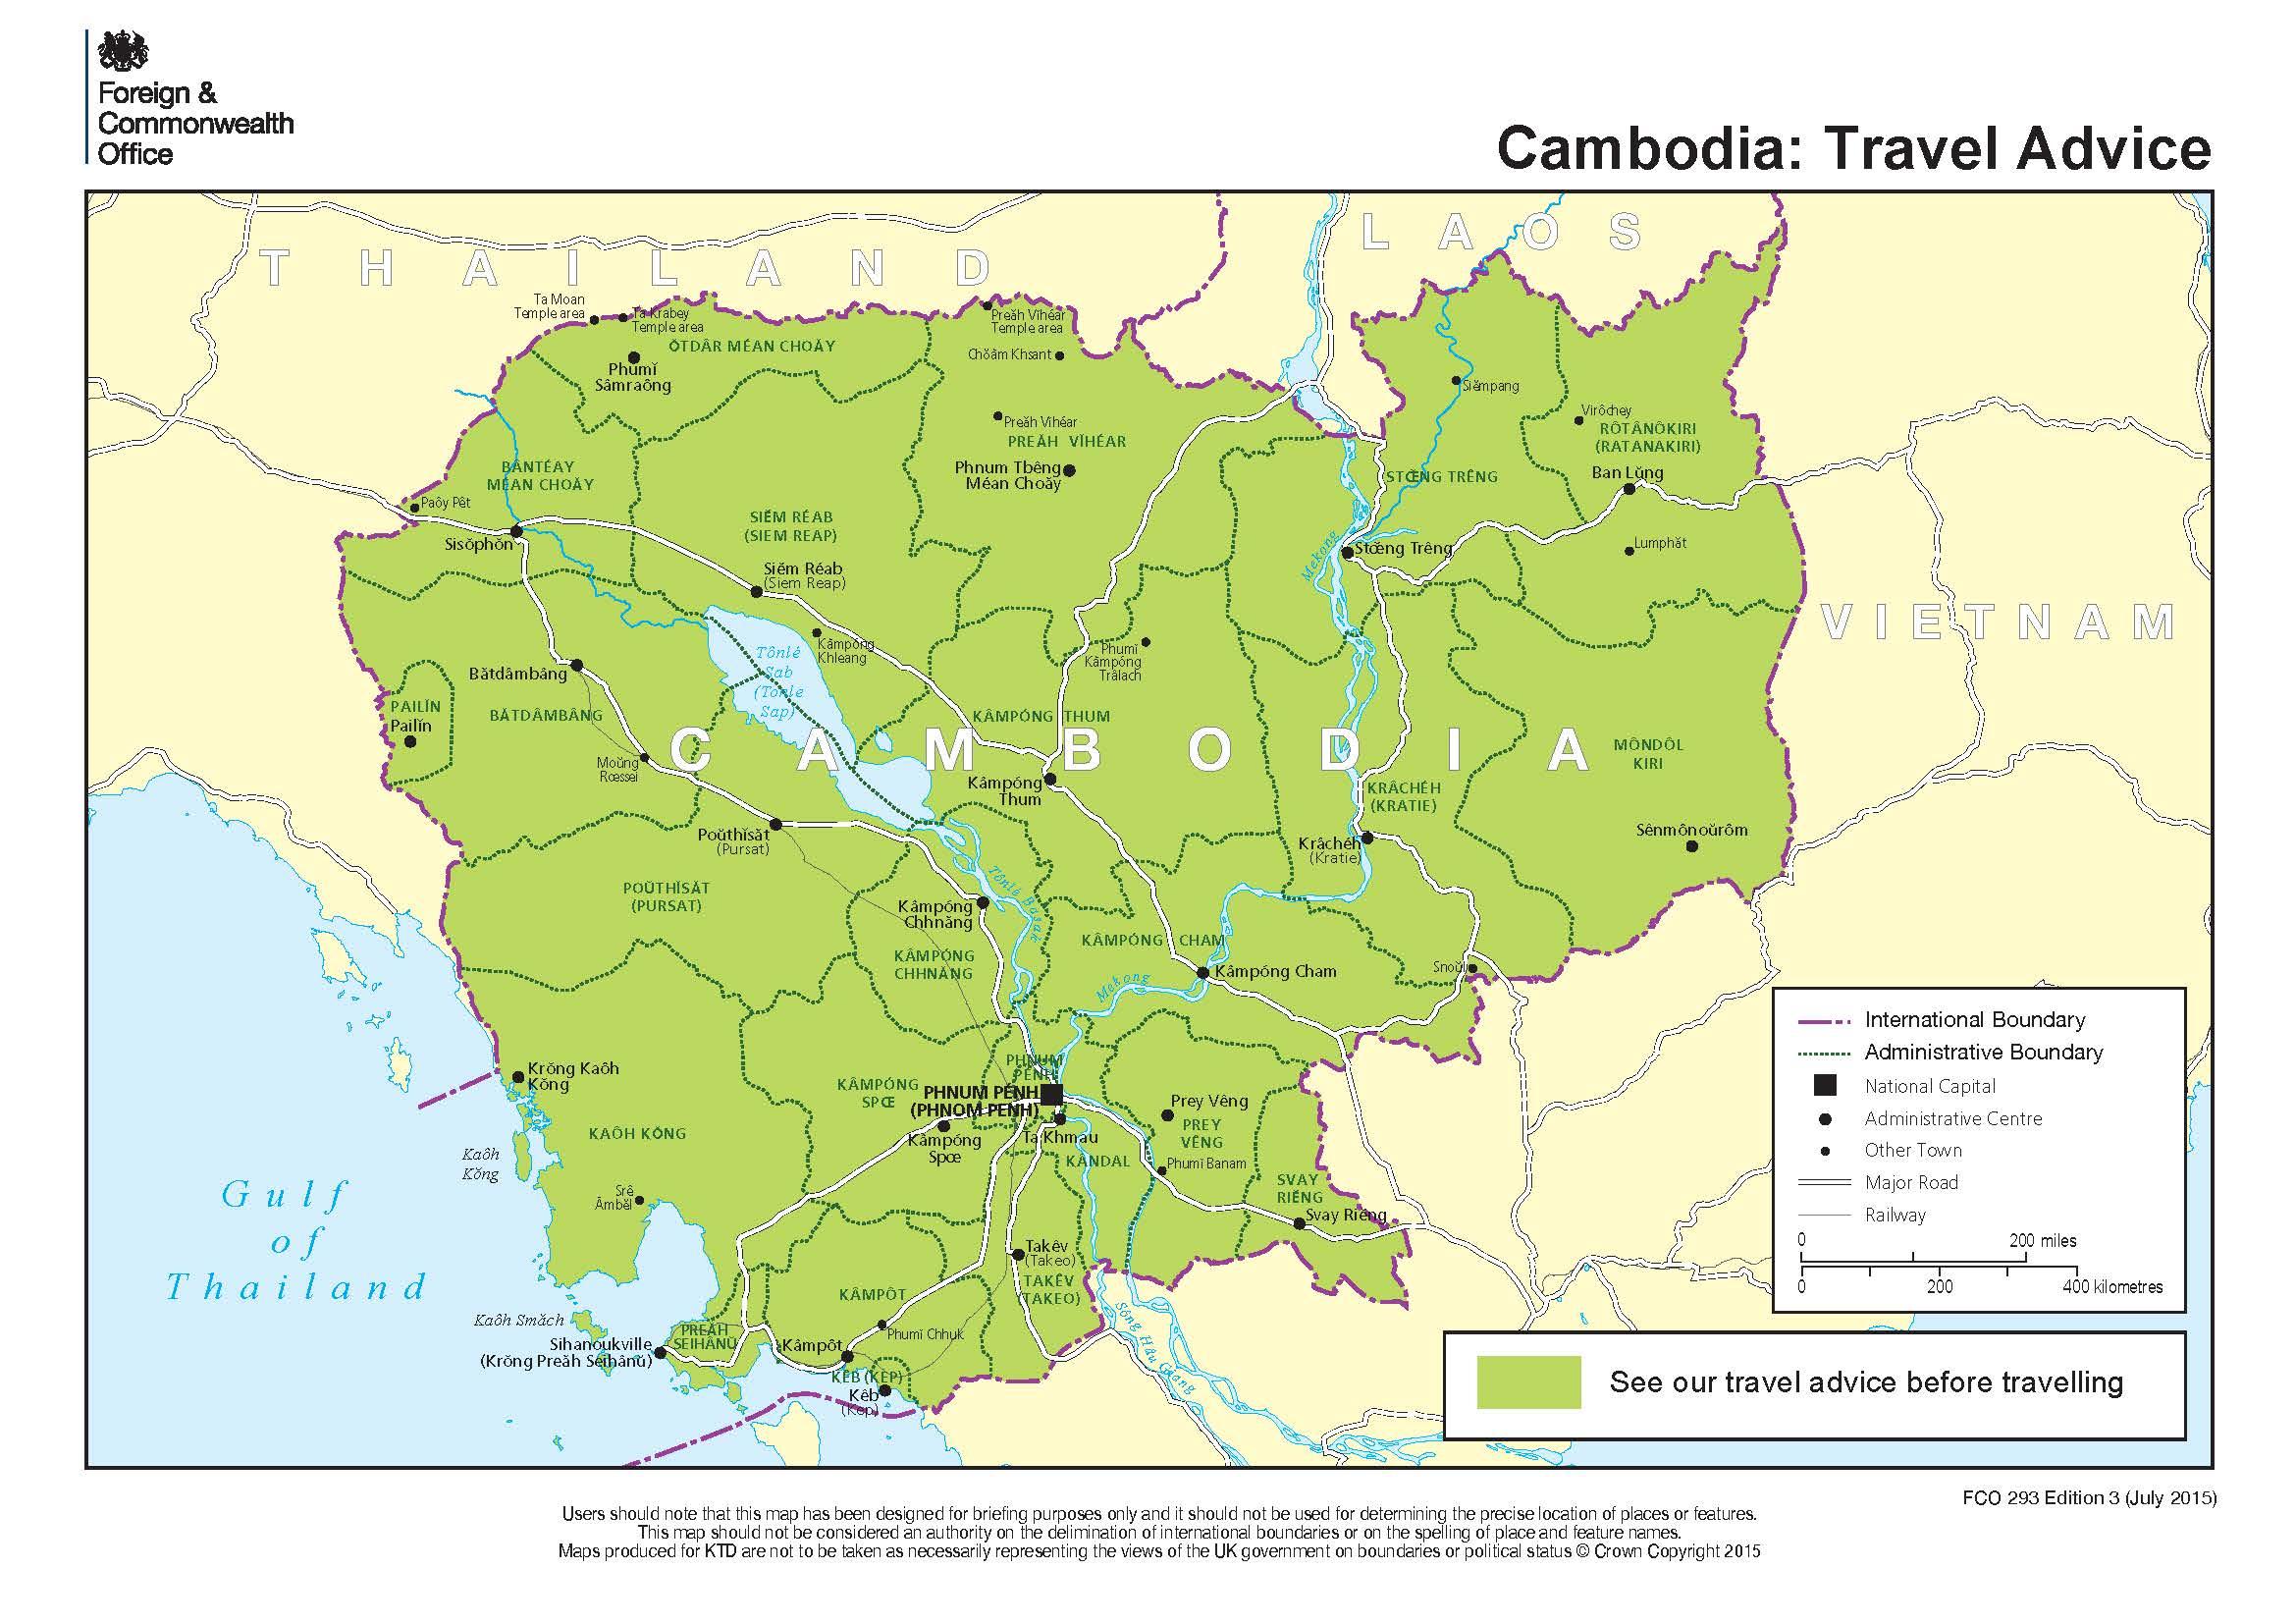 190113 cambodia travel advice map